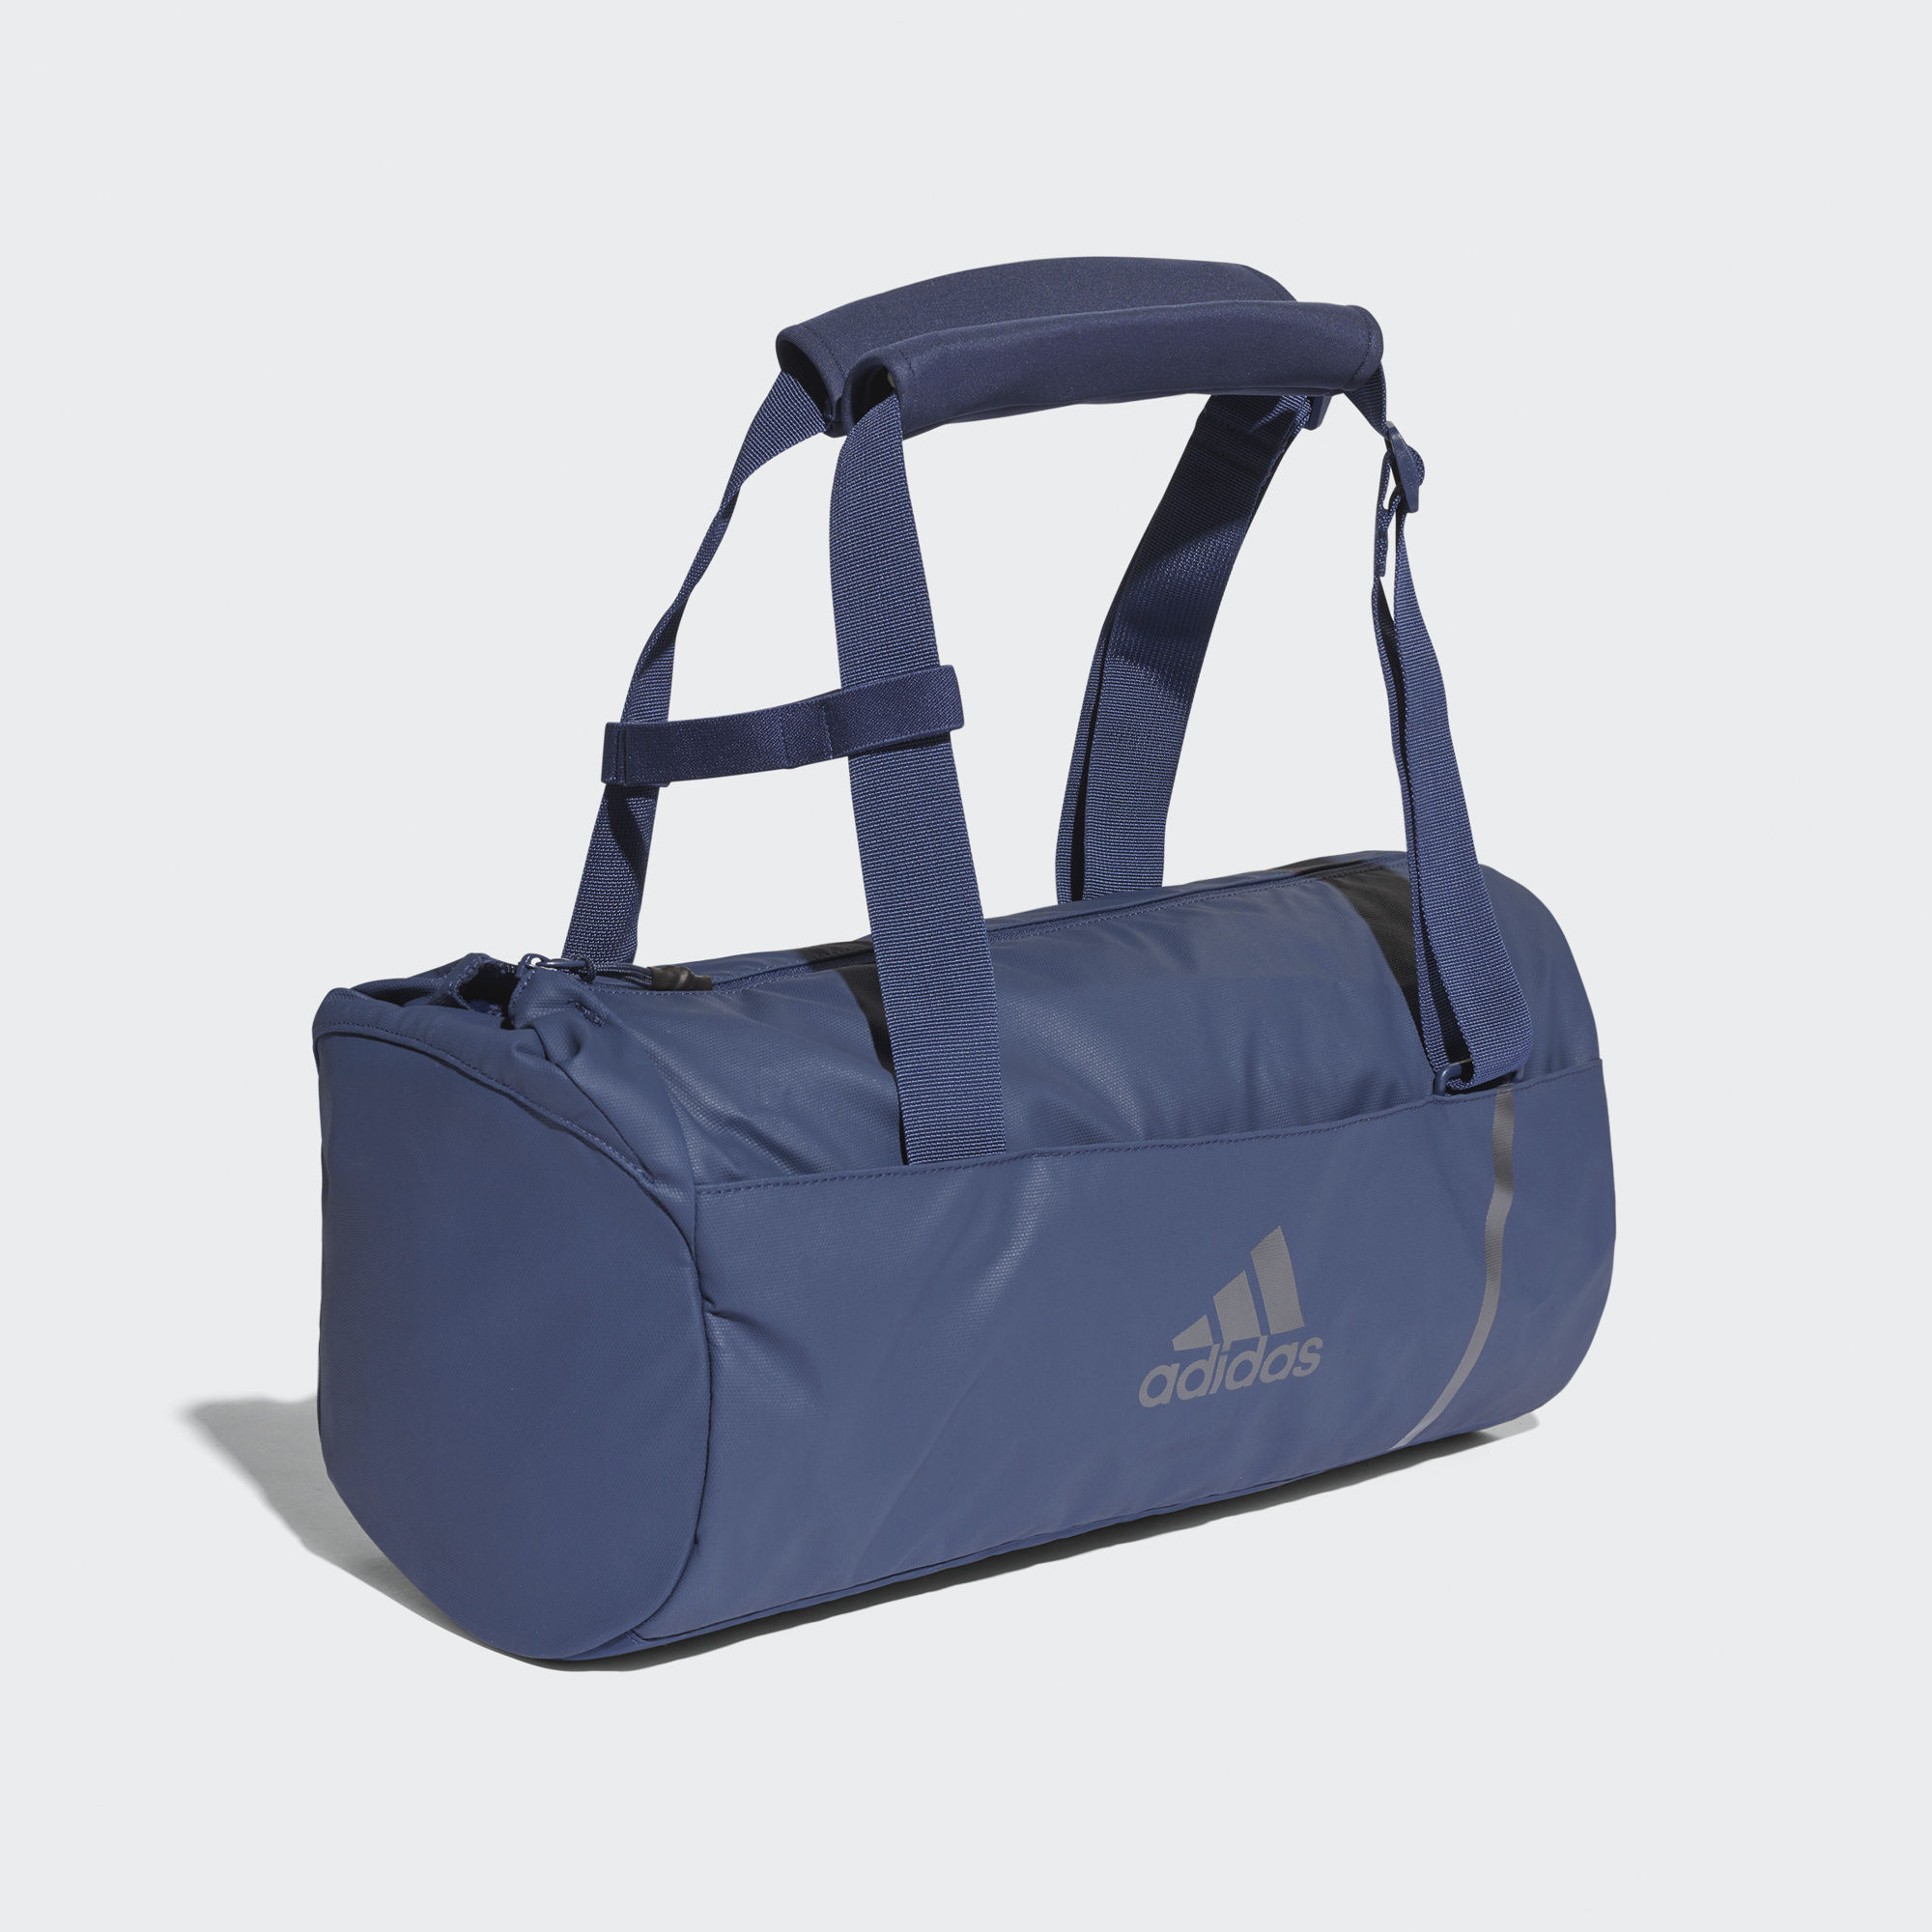 e2d58e96905a Спортивная сумка Convertible Training CF3270 adidas Performance ...